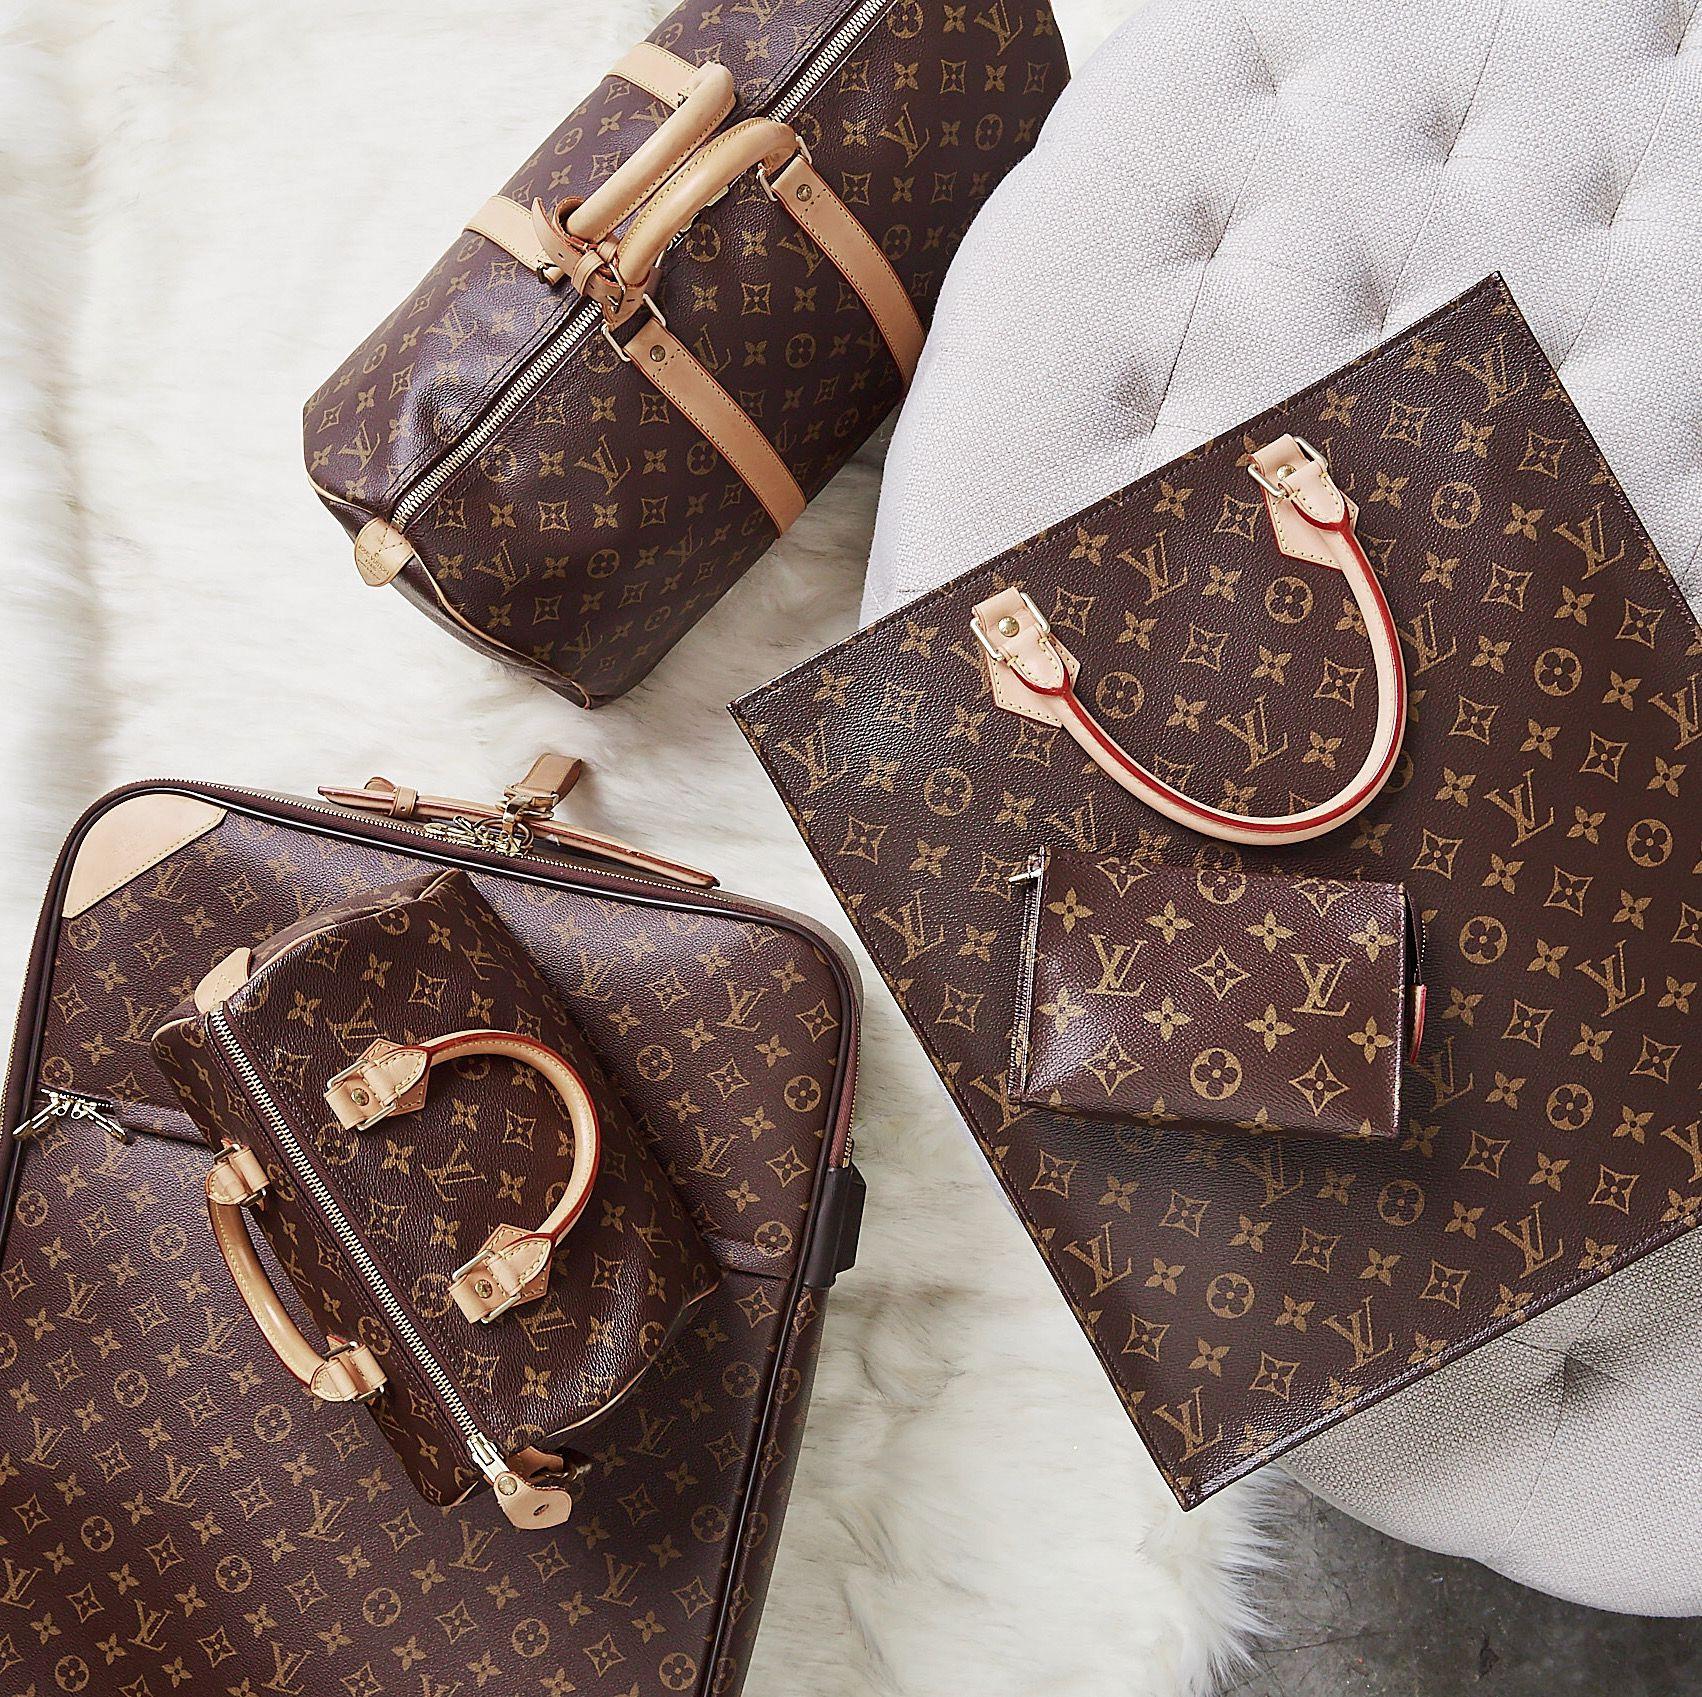 Travel In Style Louisvuitton Travel Travelinstyle Luggage Speedy Keepall Louisvuittonlugga Louis Vuitton Luggage Set Louis Vuitton Louis Vuitton Travel